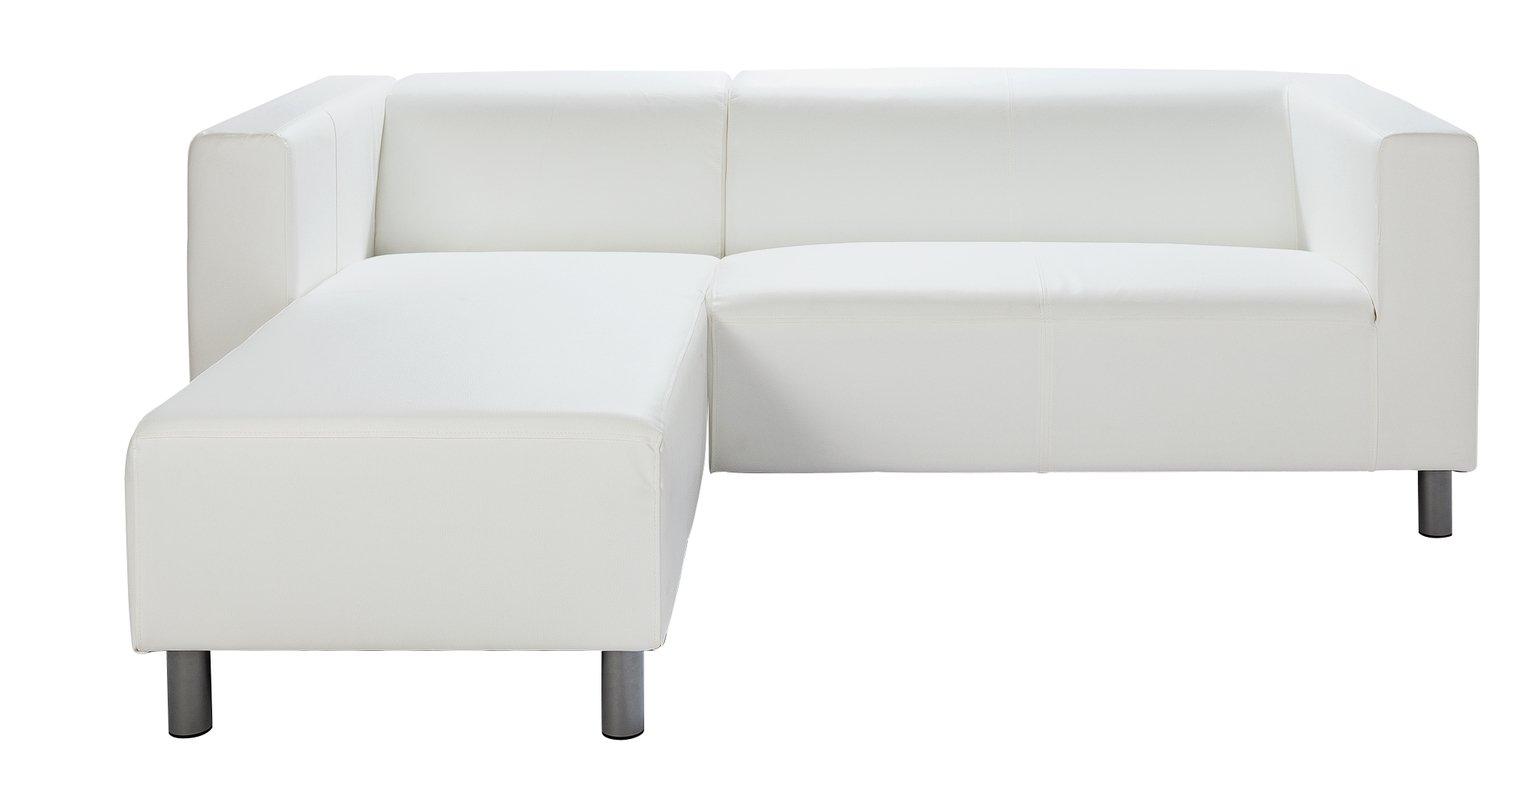 Argos Home Moda Compact Left Corner Faux Leather Sofa -White